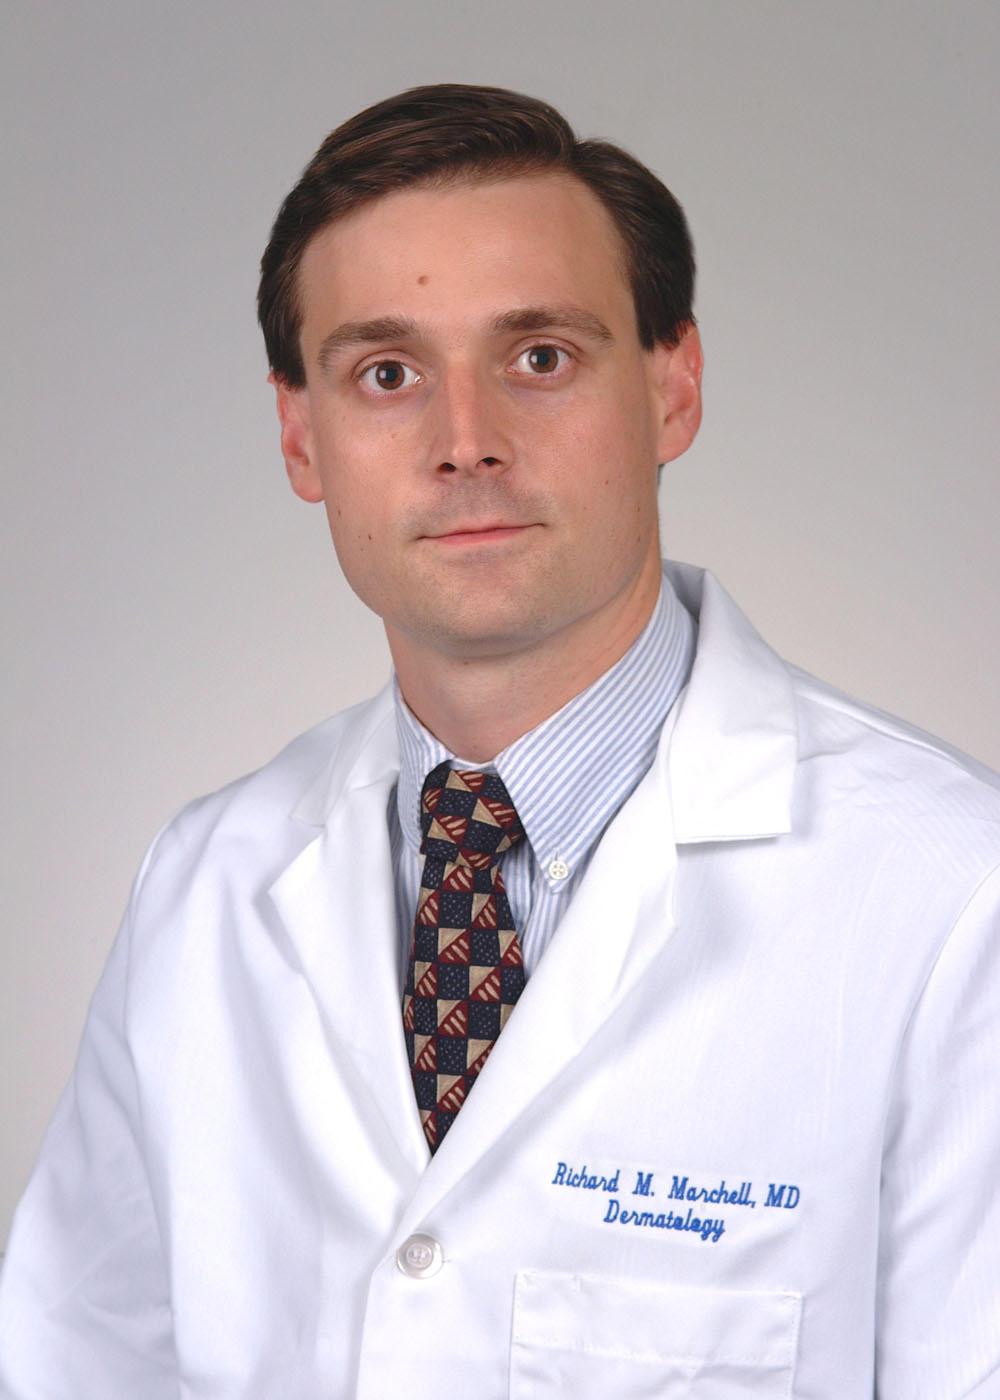 Richard M Marchell MD